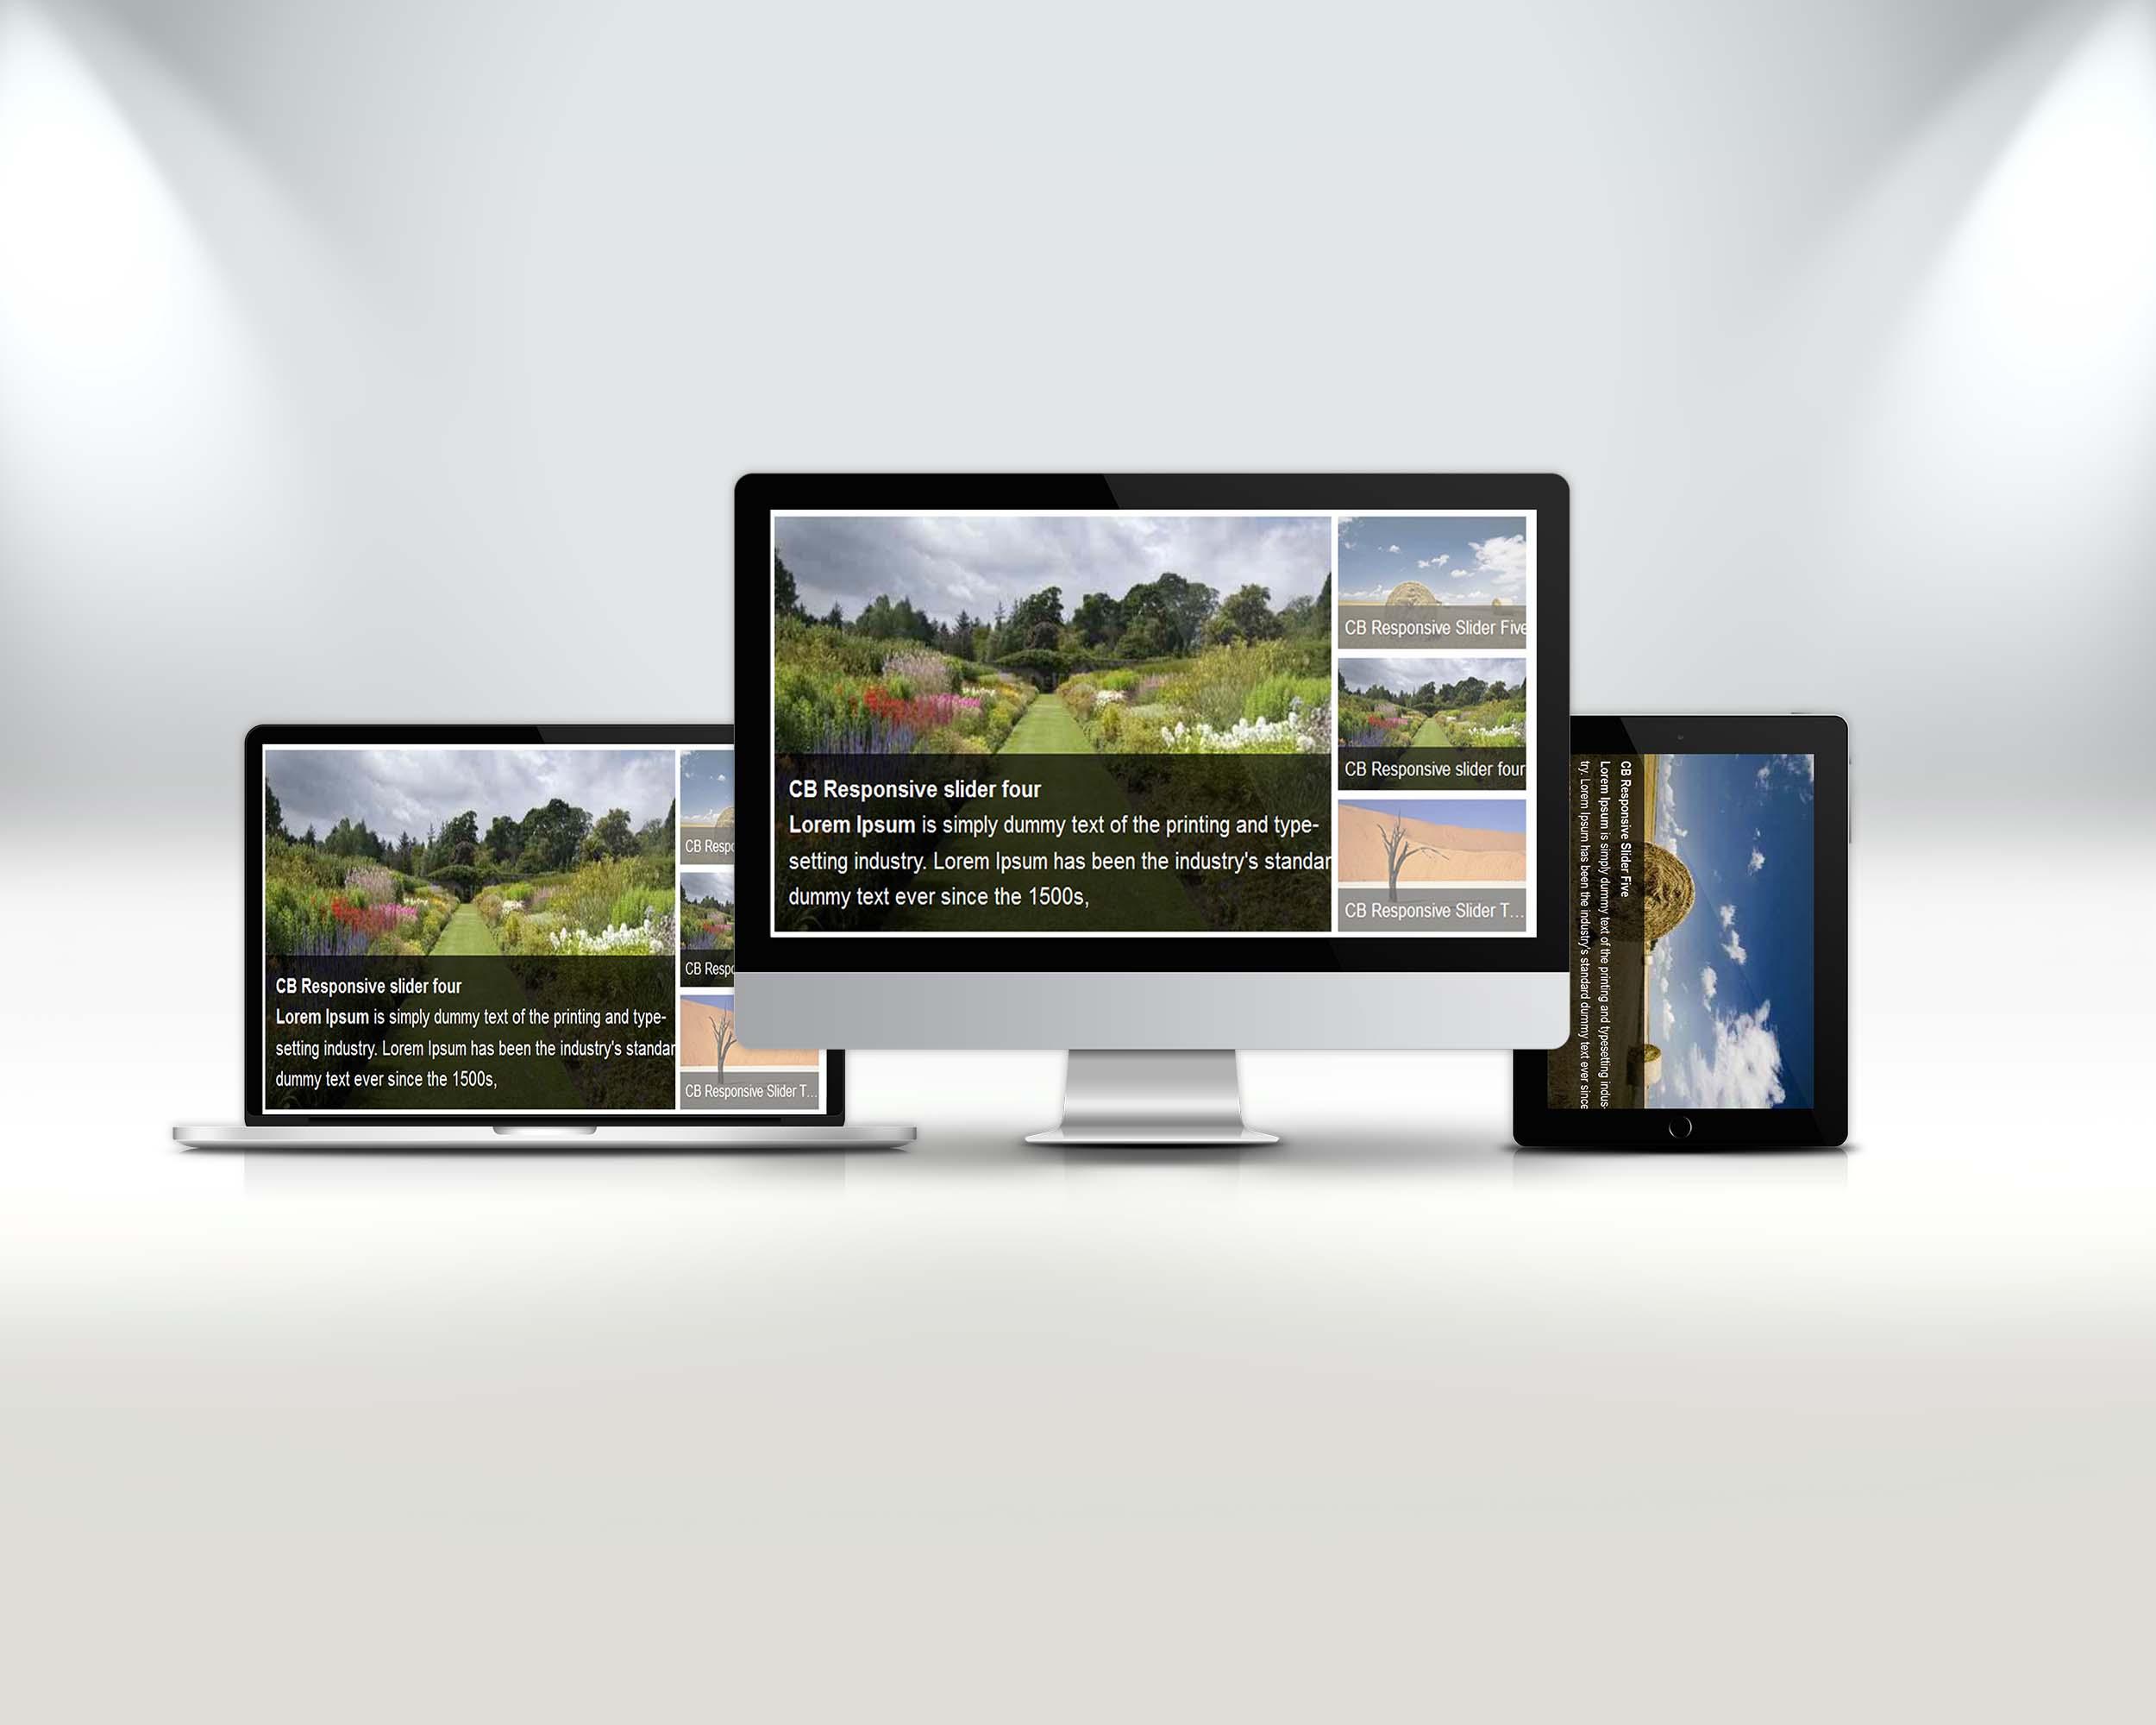 CB Full Responsive Slider WordPress Plugin - Coding Bank